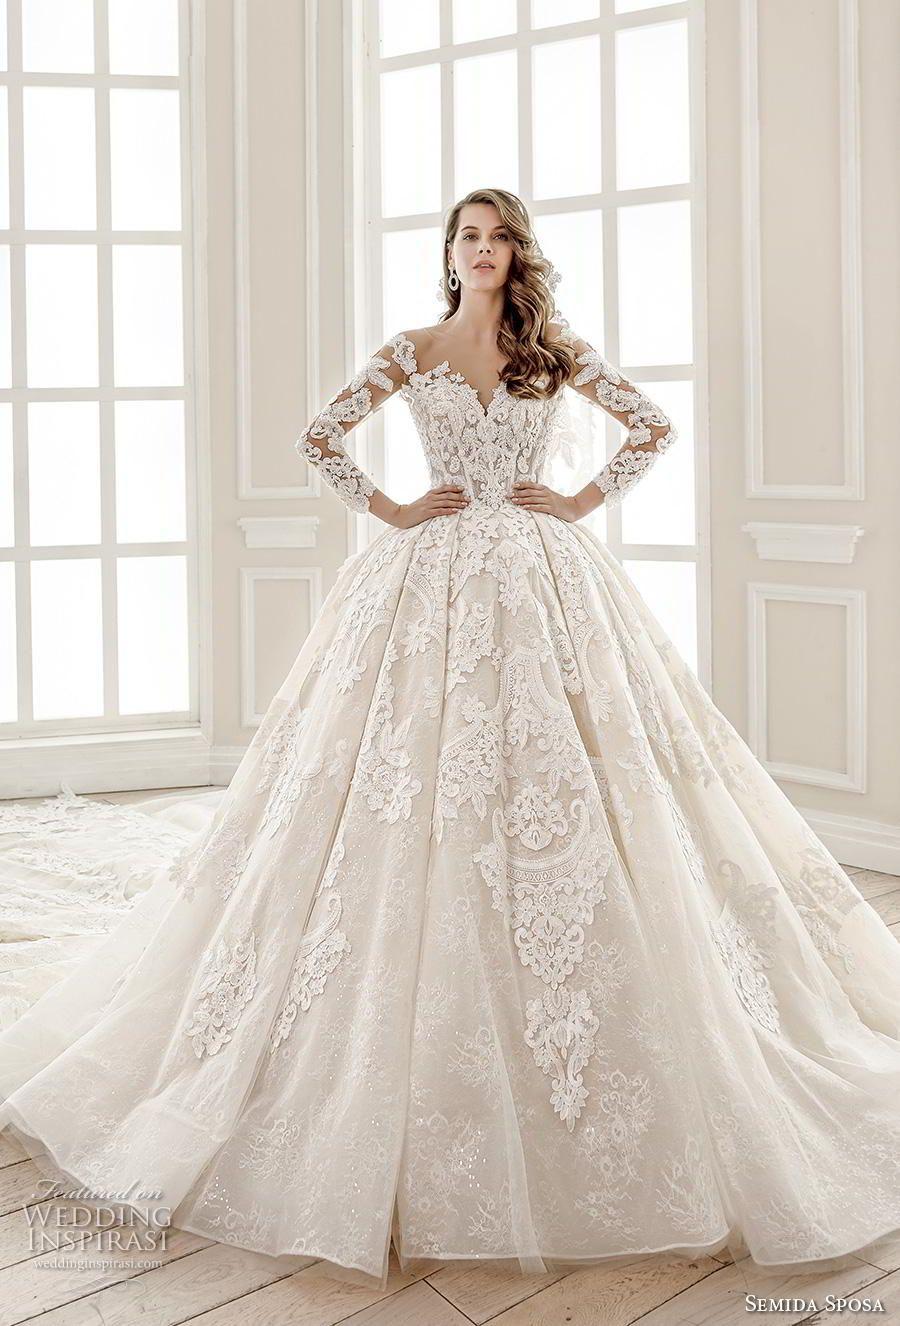 Semida Sposa 2020 Wedding Dresses Amazon Bridal Collection Sheer Wedding Dress Bridal Dresses Wedding Dresses Amazon